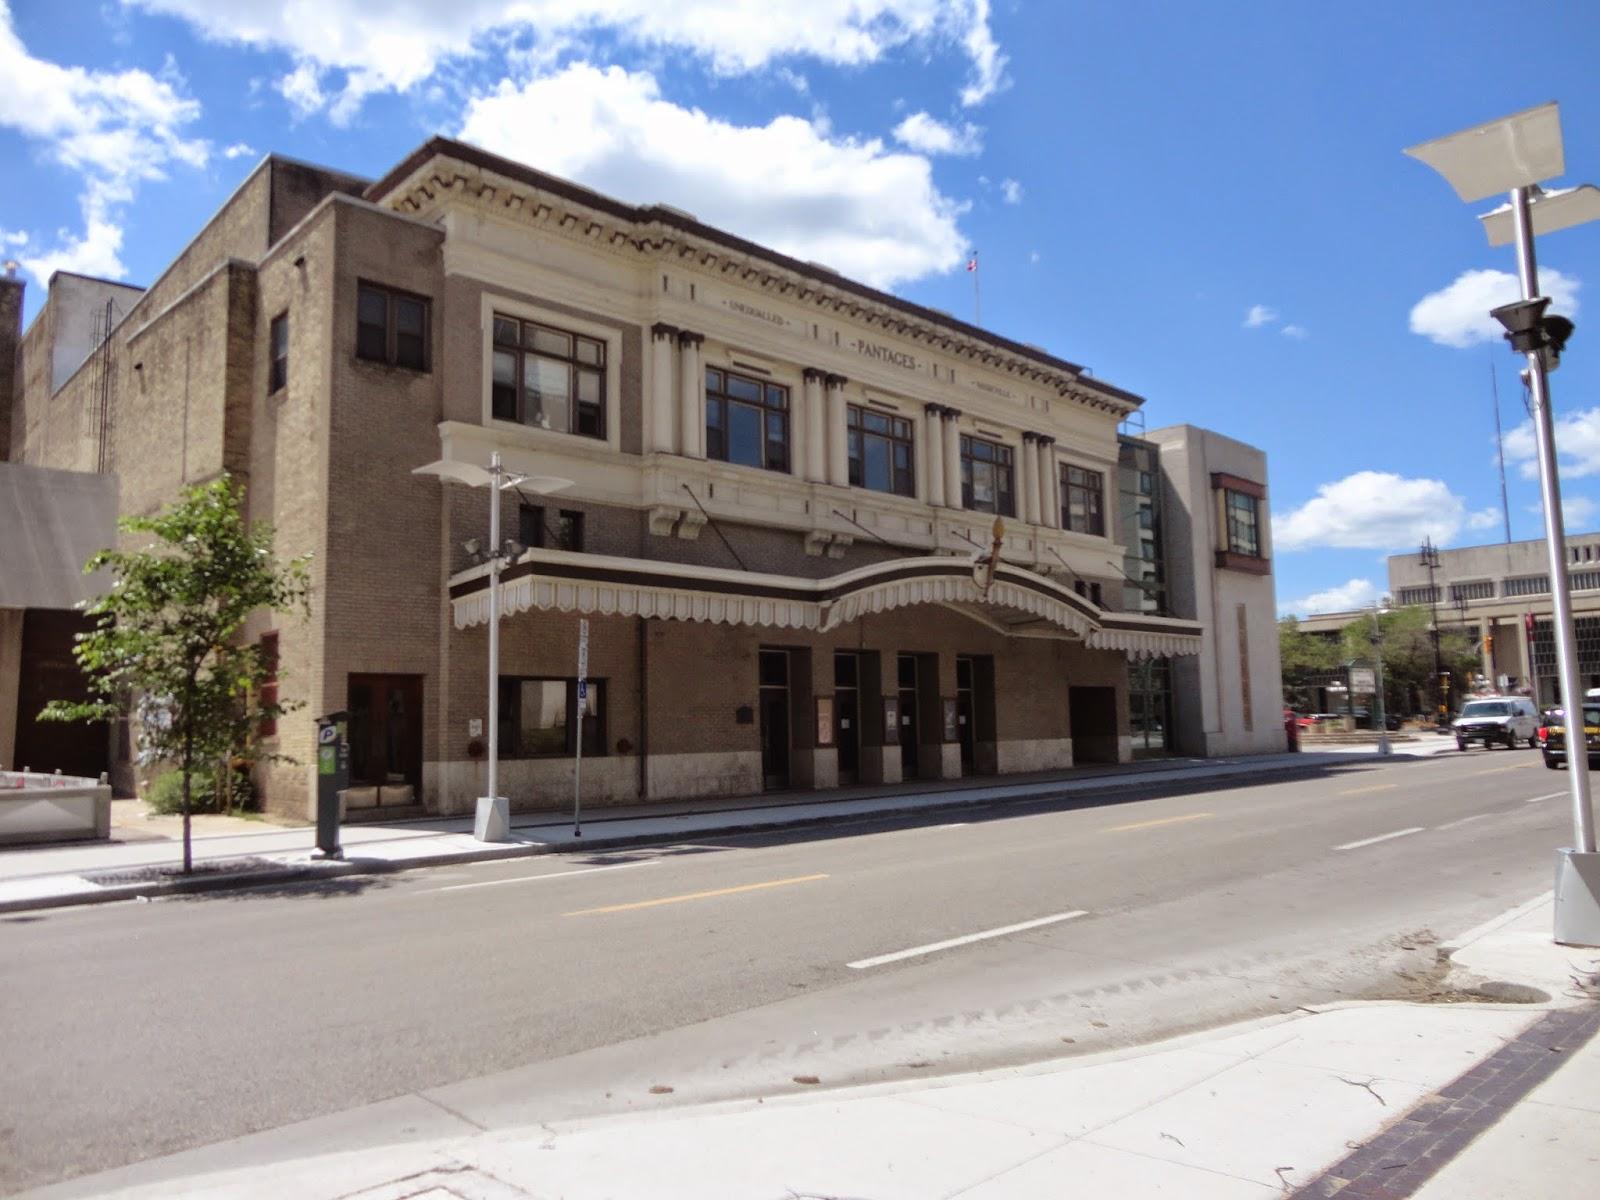 Exterior of Pantages Playhouse